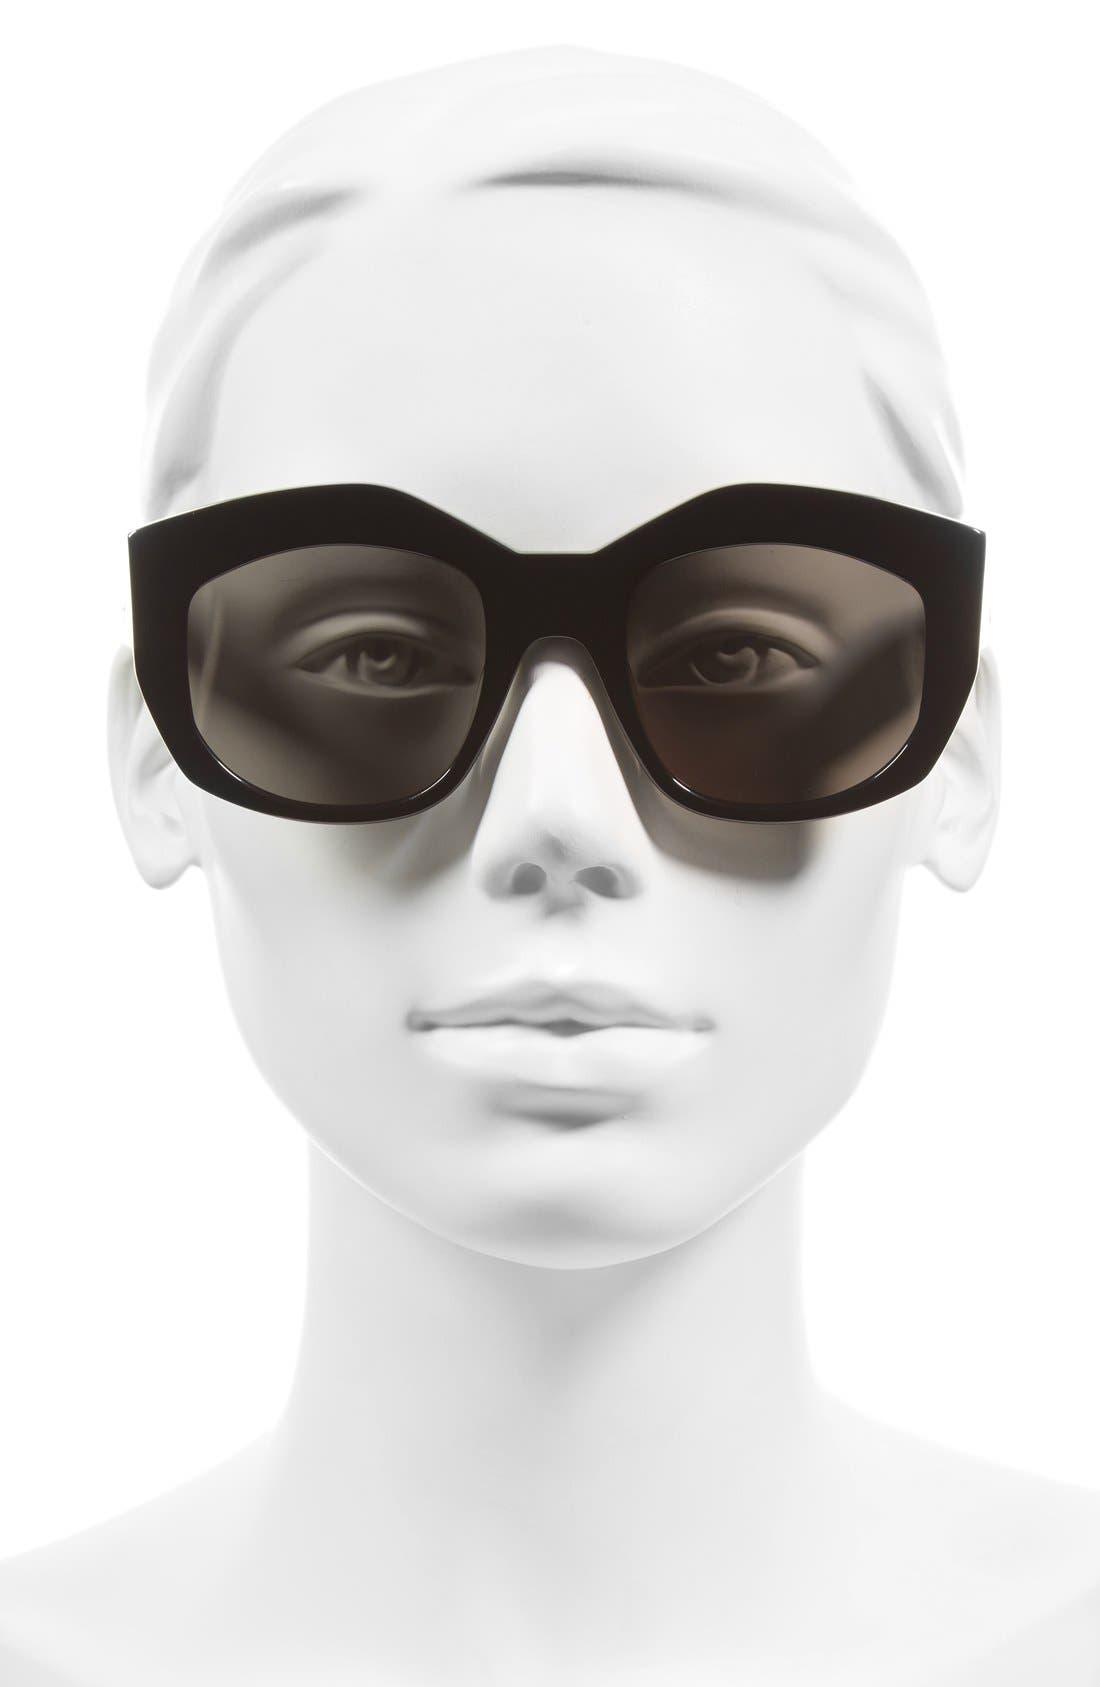 50mm Badland Sunglasses,                             Alternate thumbnail 2, color,                             Gloss Black